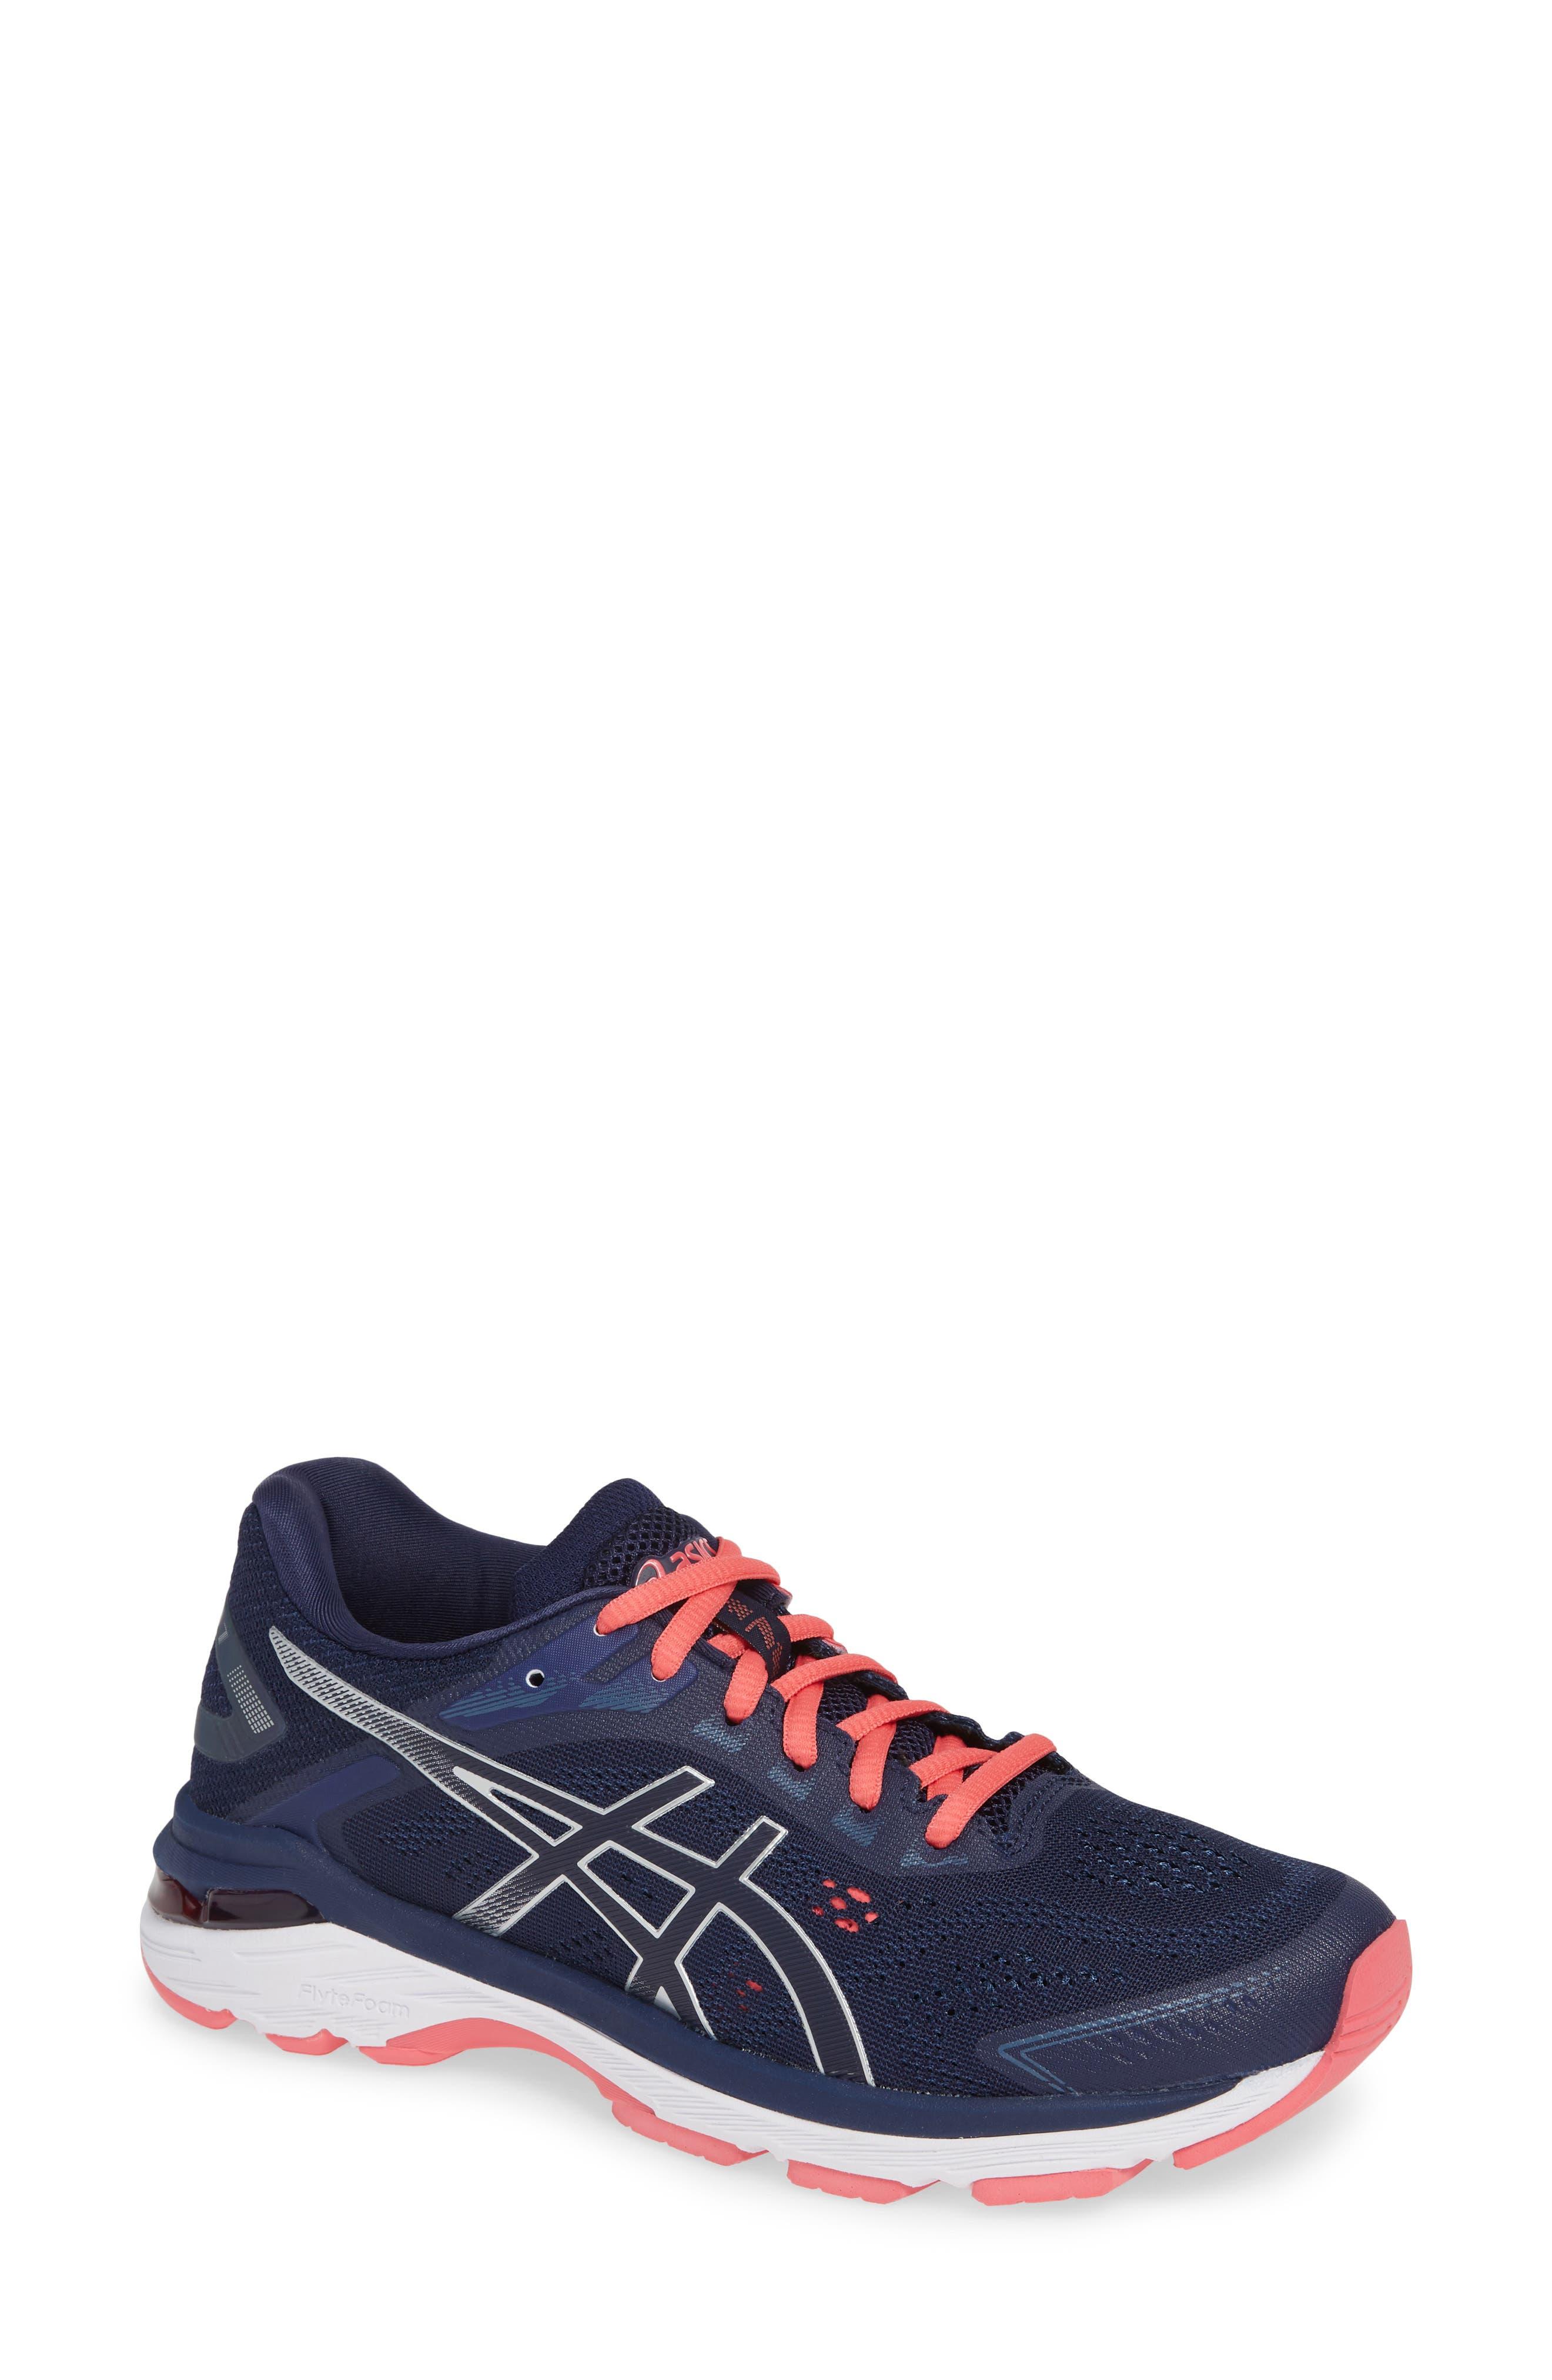 Asics Gt-2000 7 Running Shoe